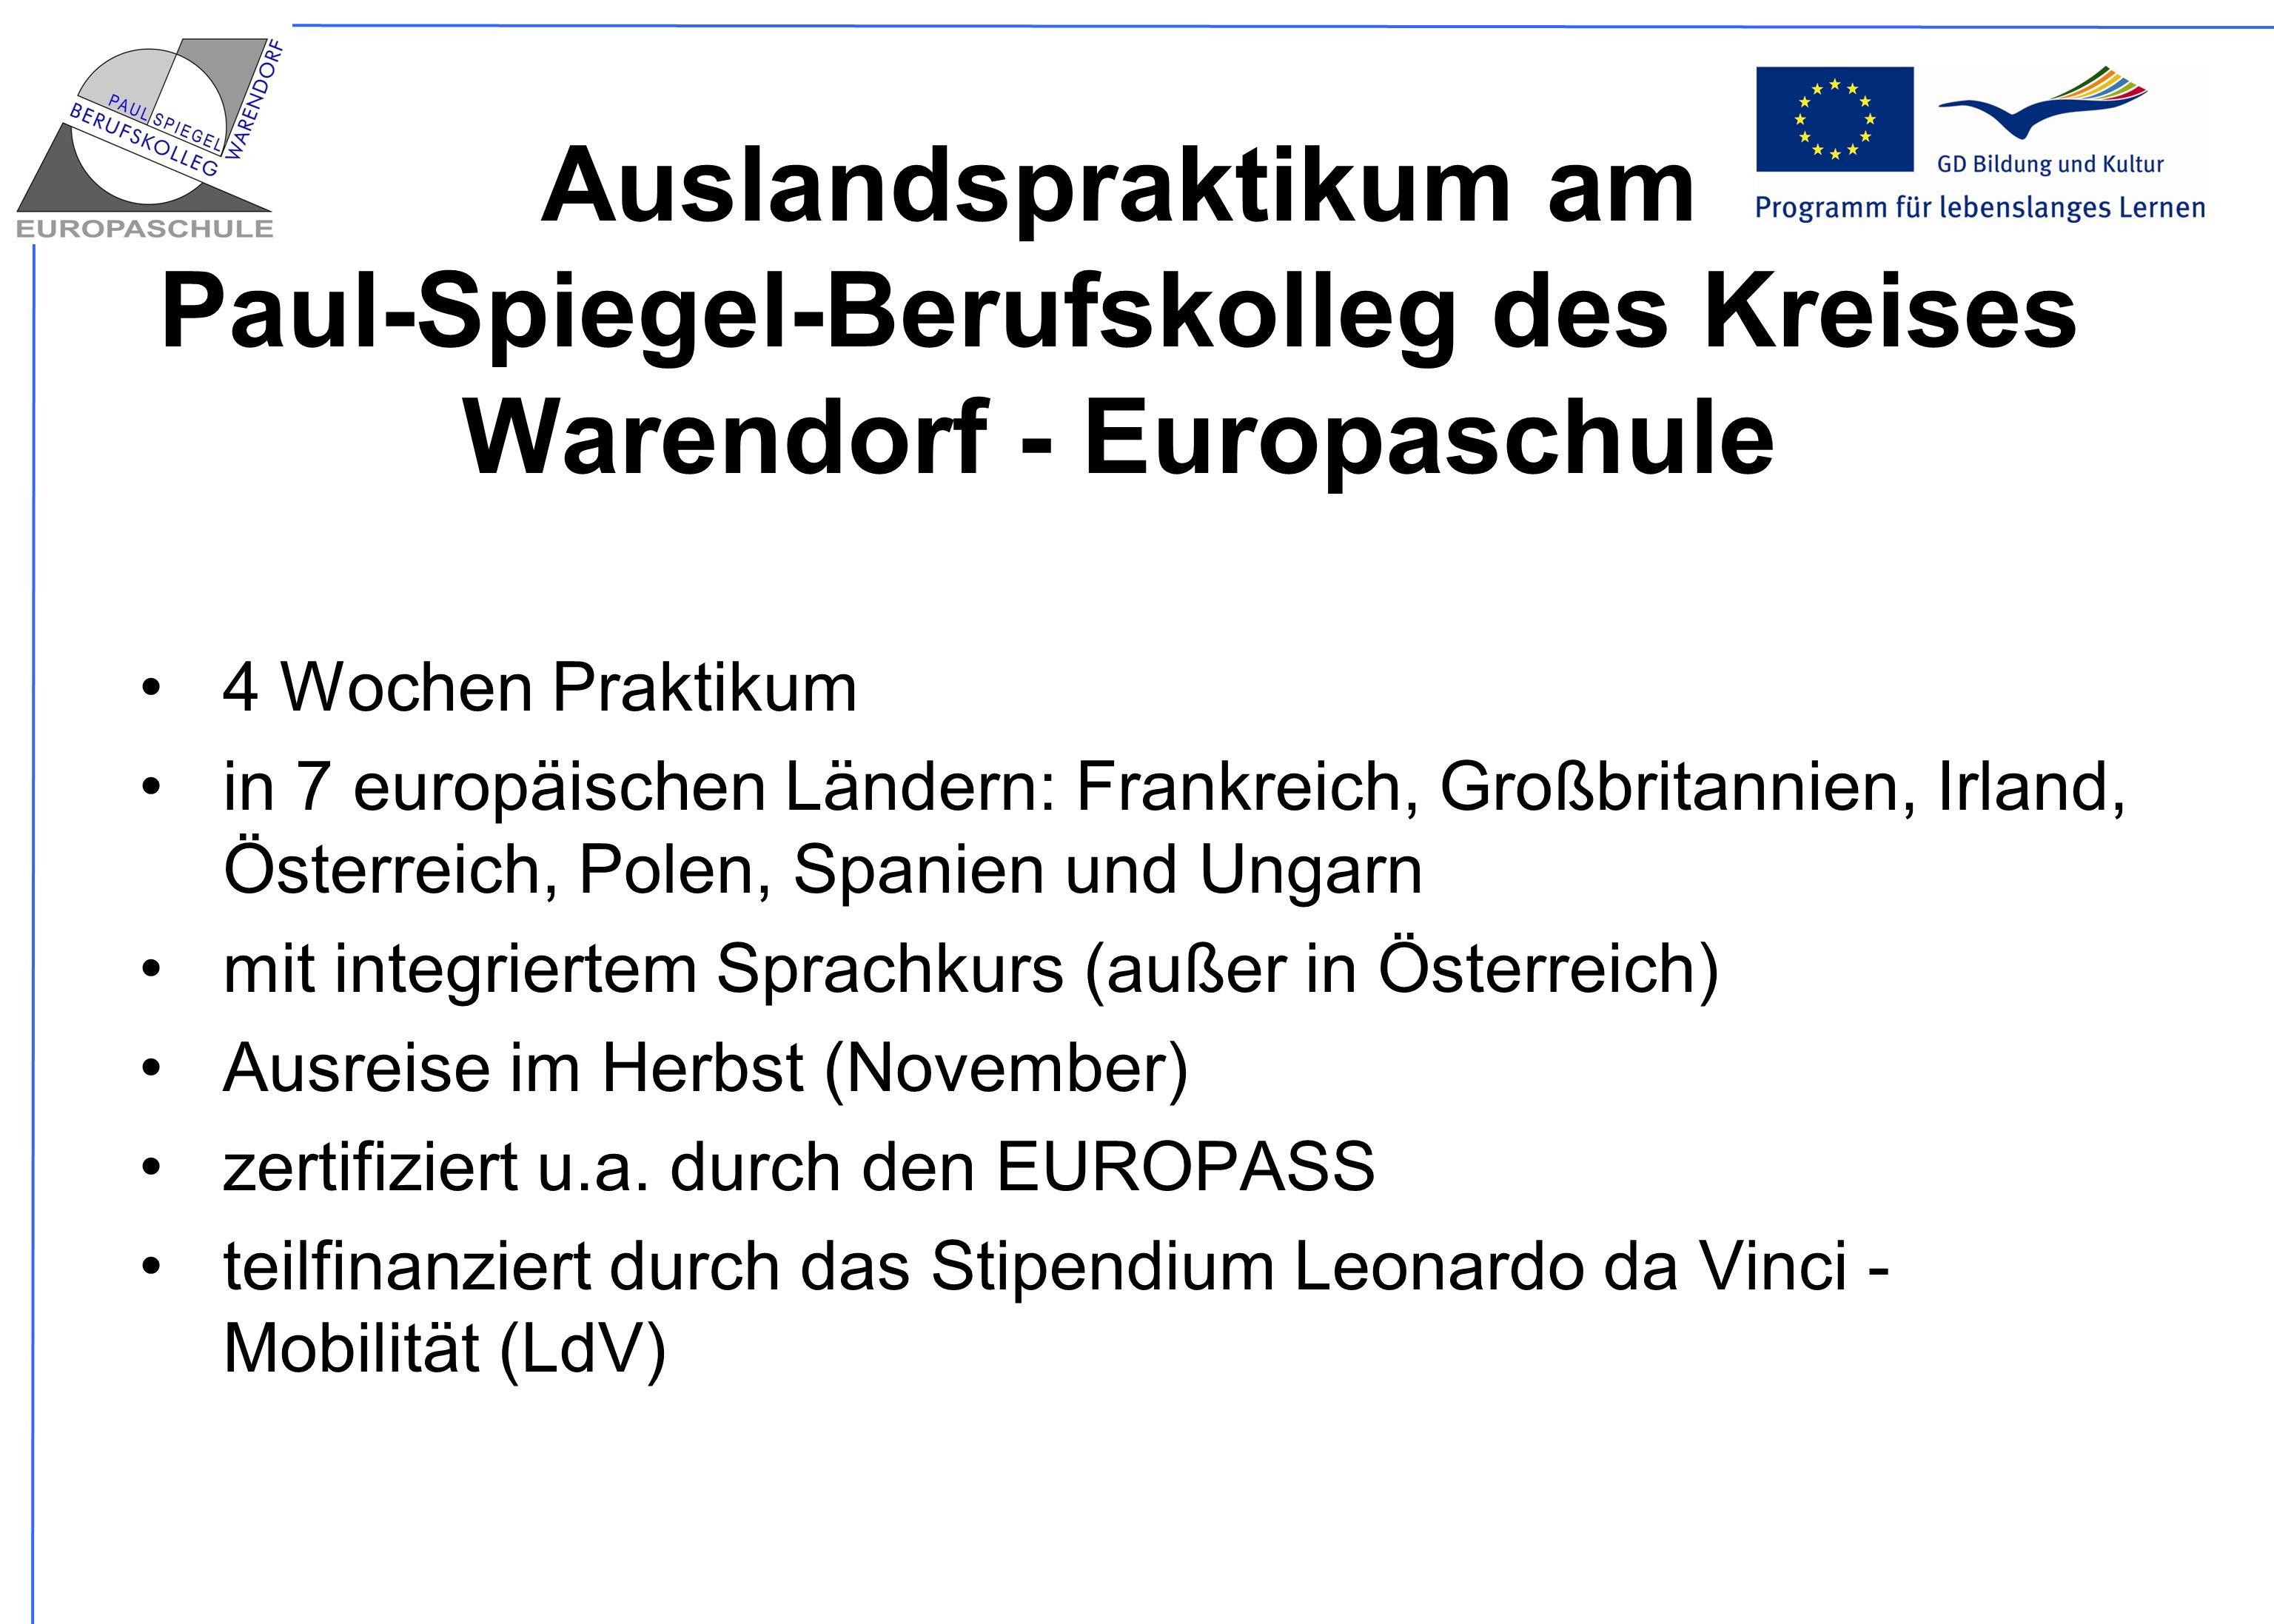 Auslandspraktikum am Paul-Spiegel-Berufskolleg des Kreises Warendorf - Europaschule